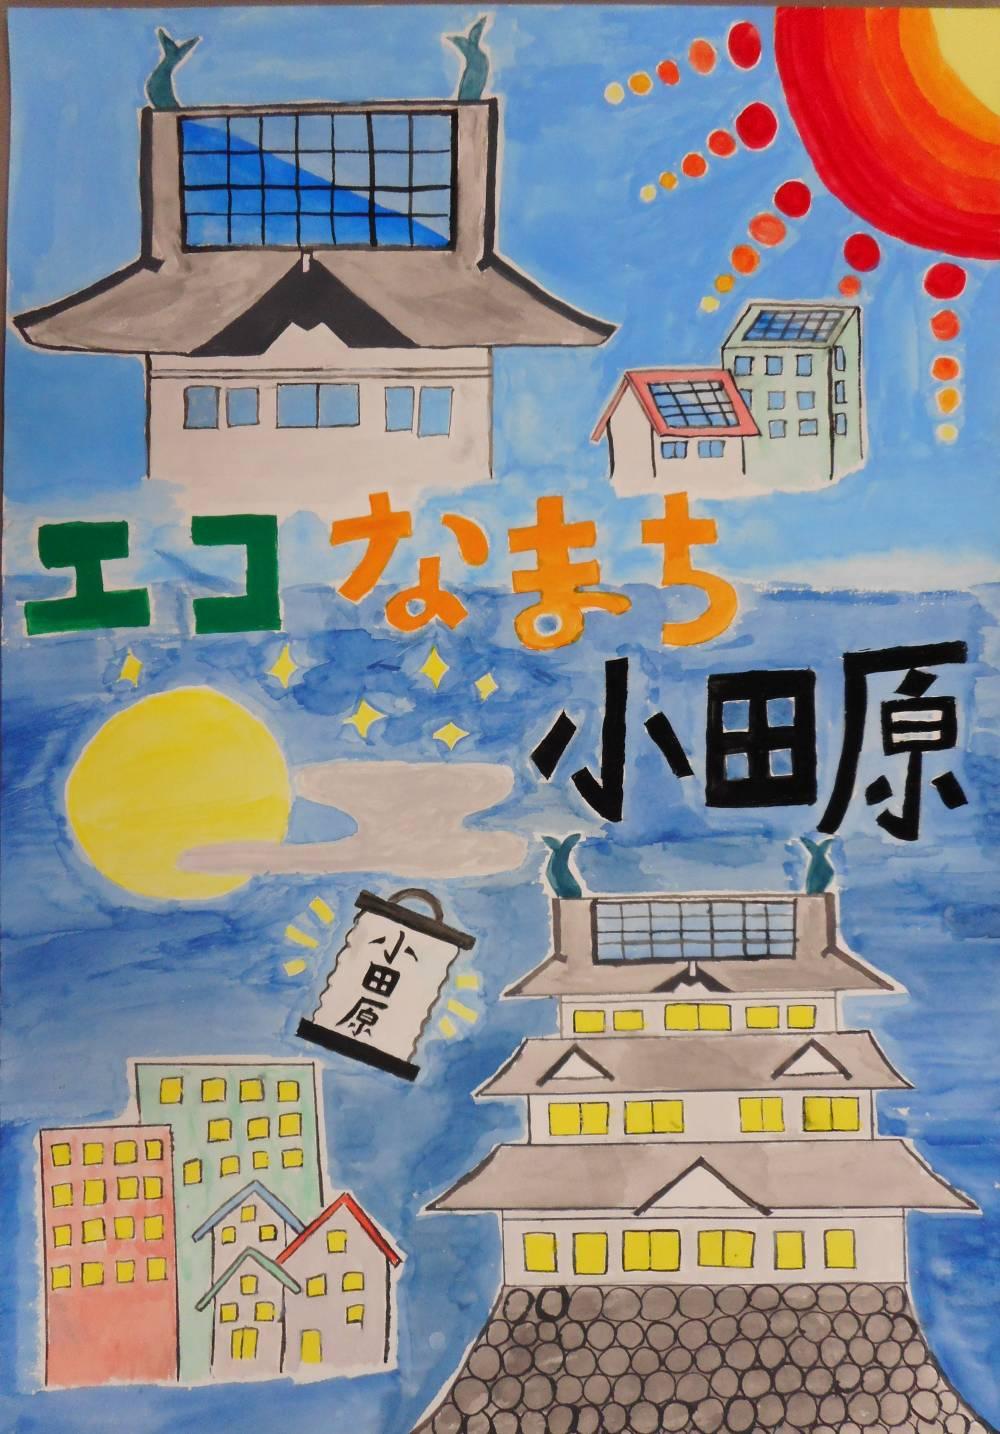 中学生の部さがみ信用金庫賞小田原市立城南中学校3年大岡千咲